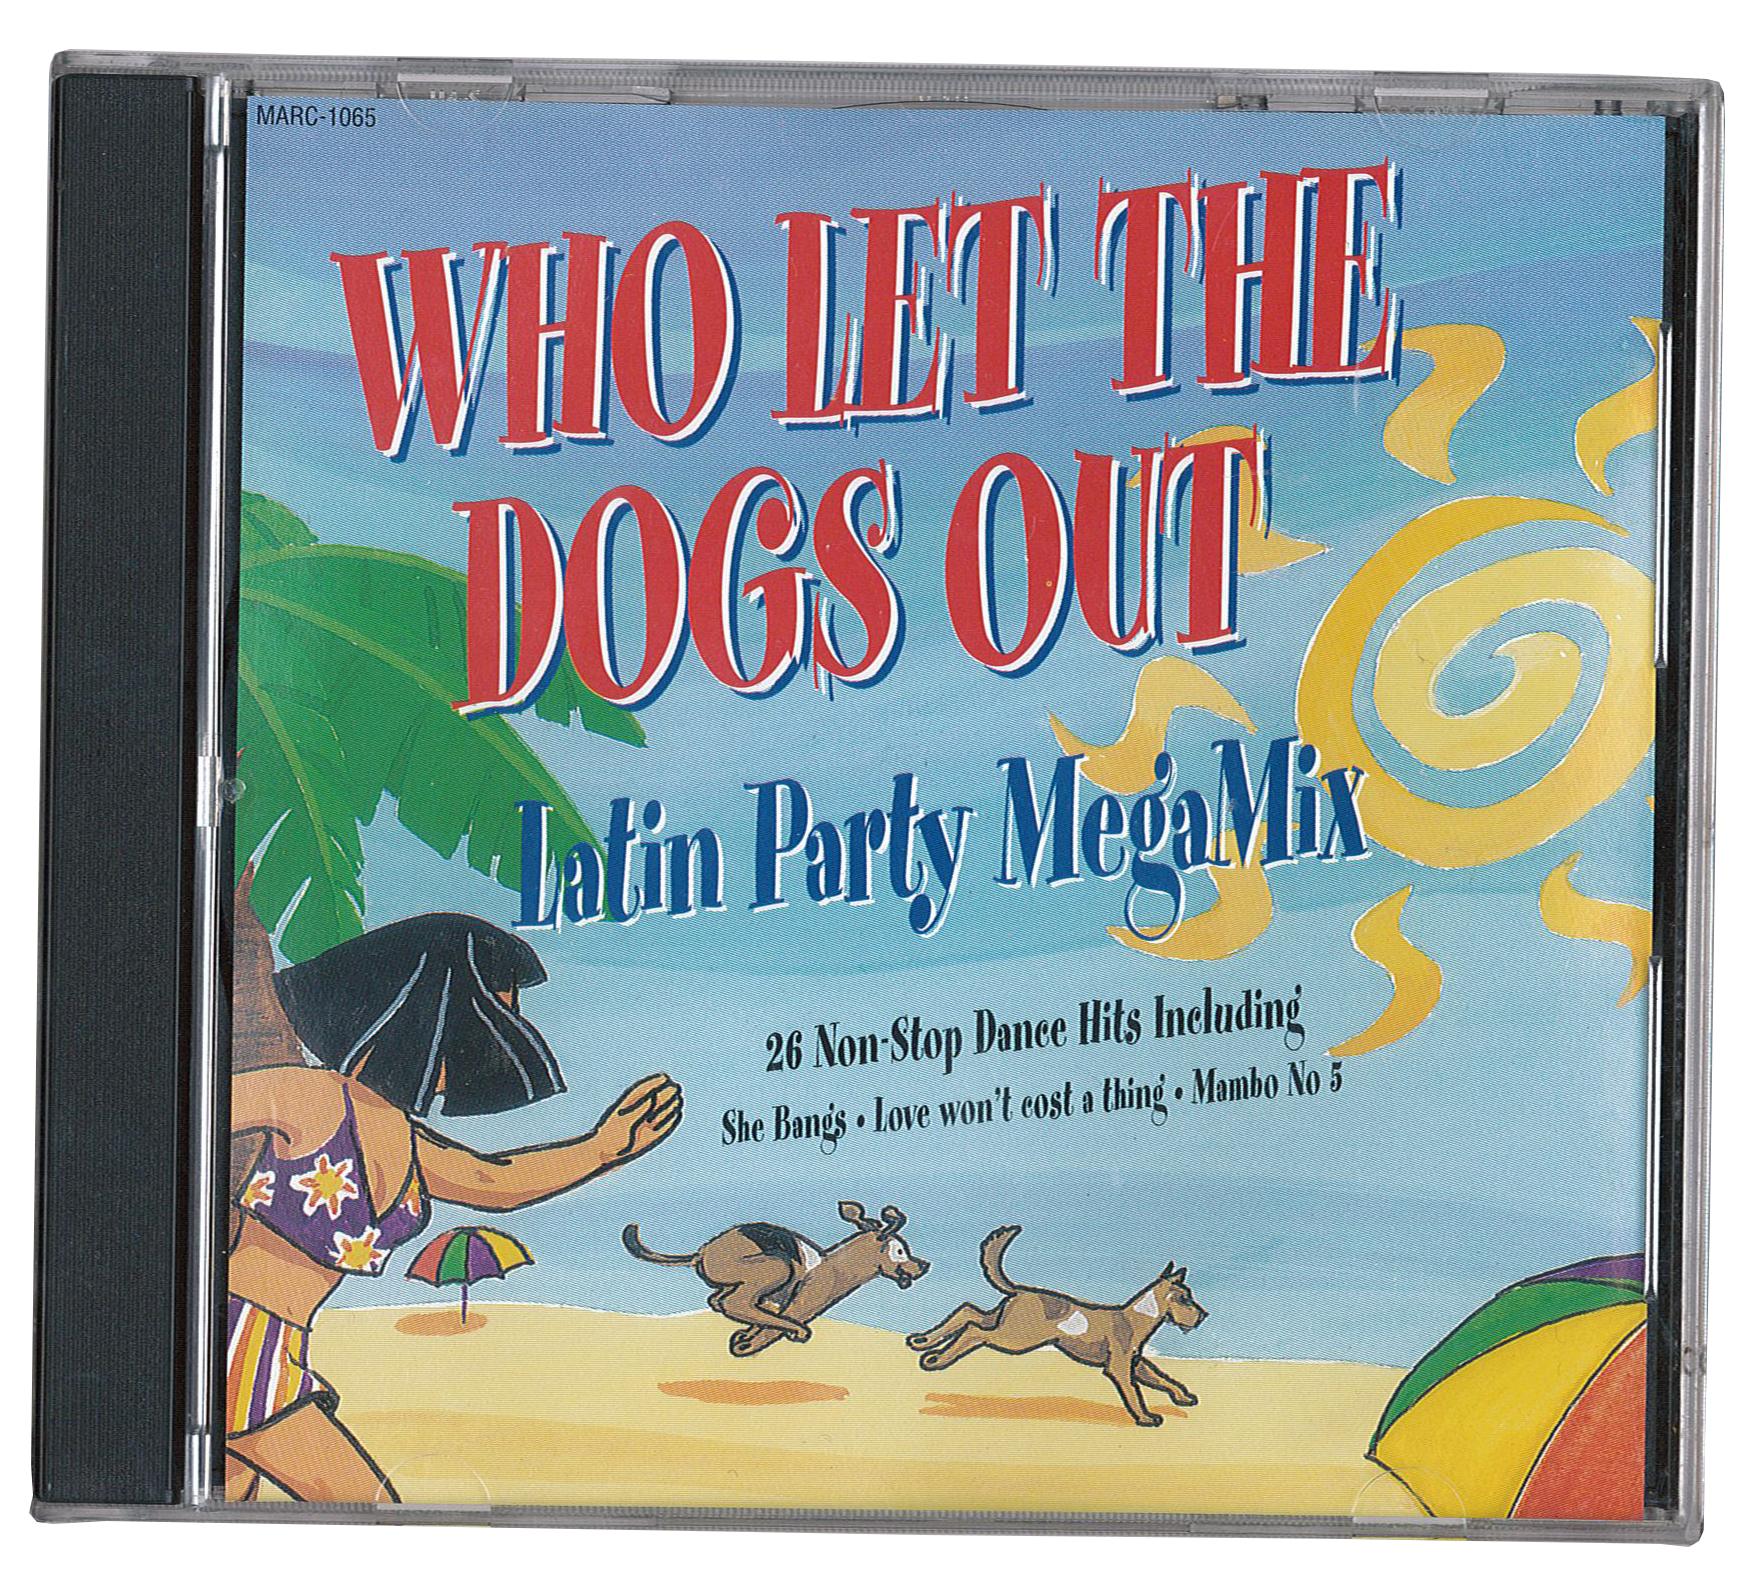 WLWLTDOO-2001-CD-WLTDO-LATIN_PARTY_MEGAMIX-FRONT.jpg